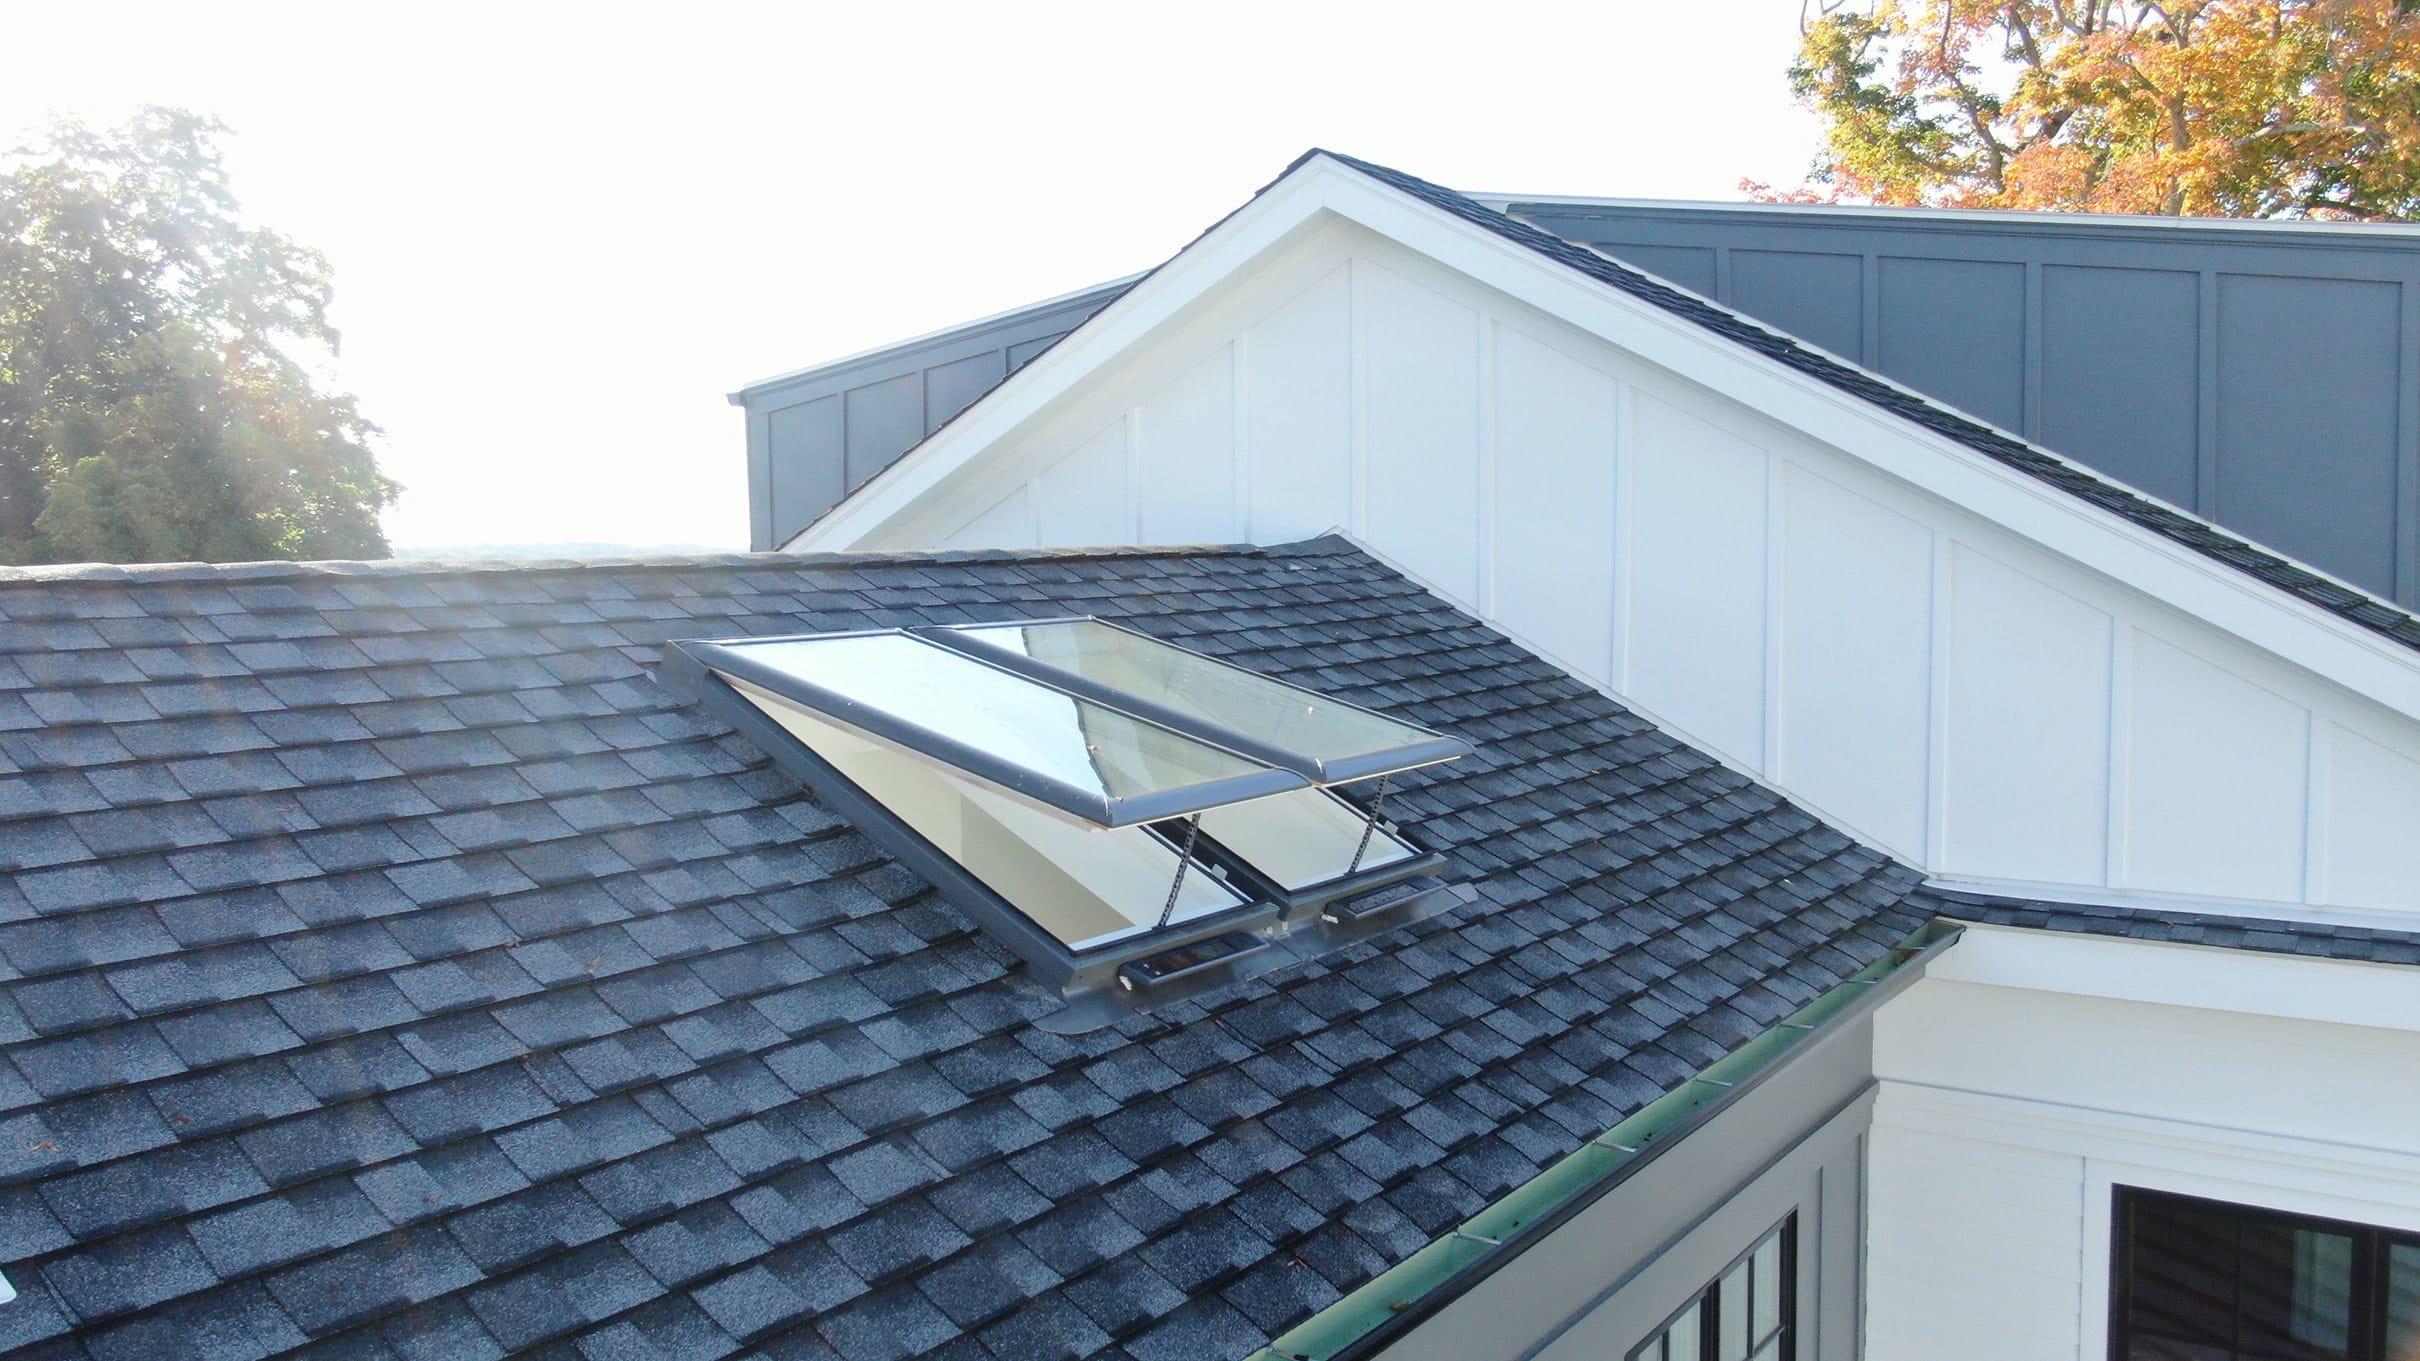 Two open skylights on a shingle roof